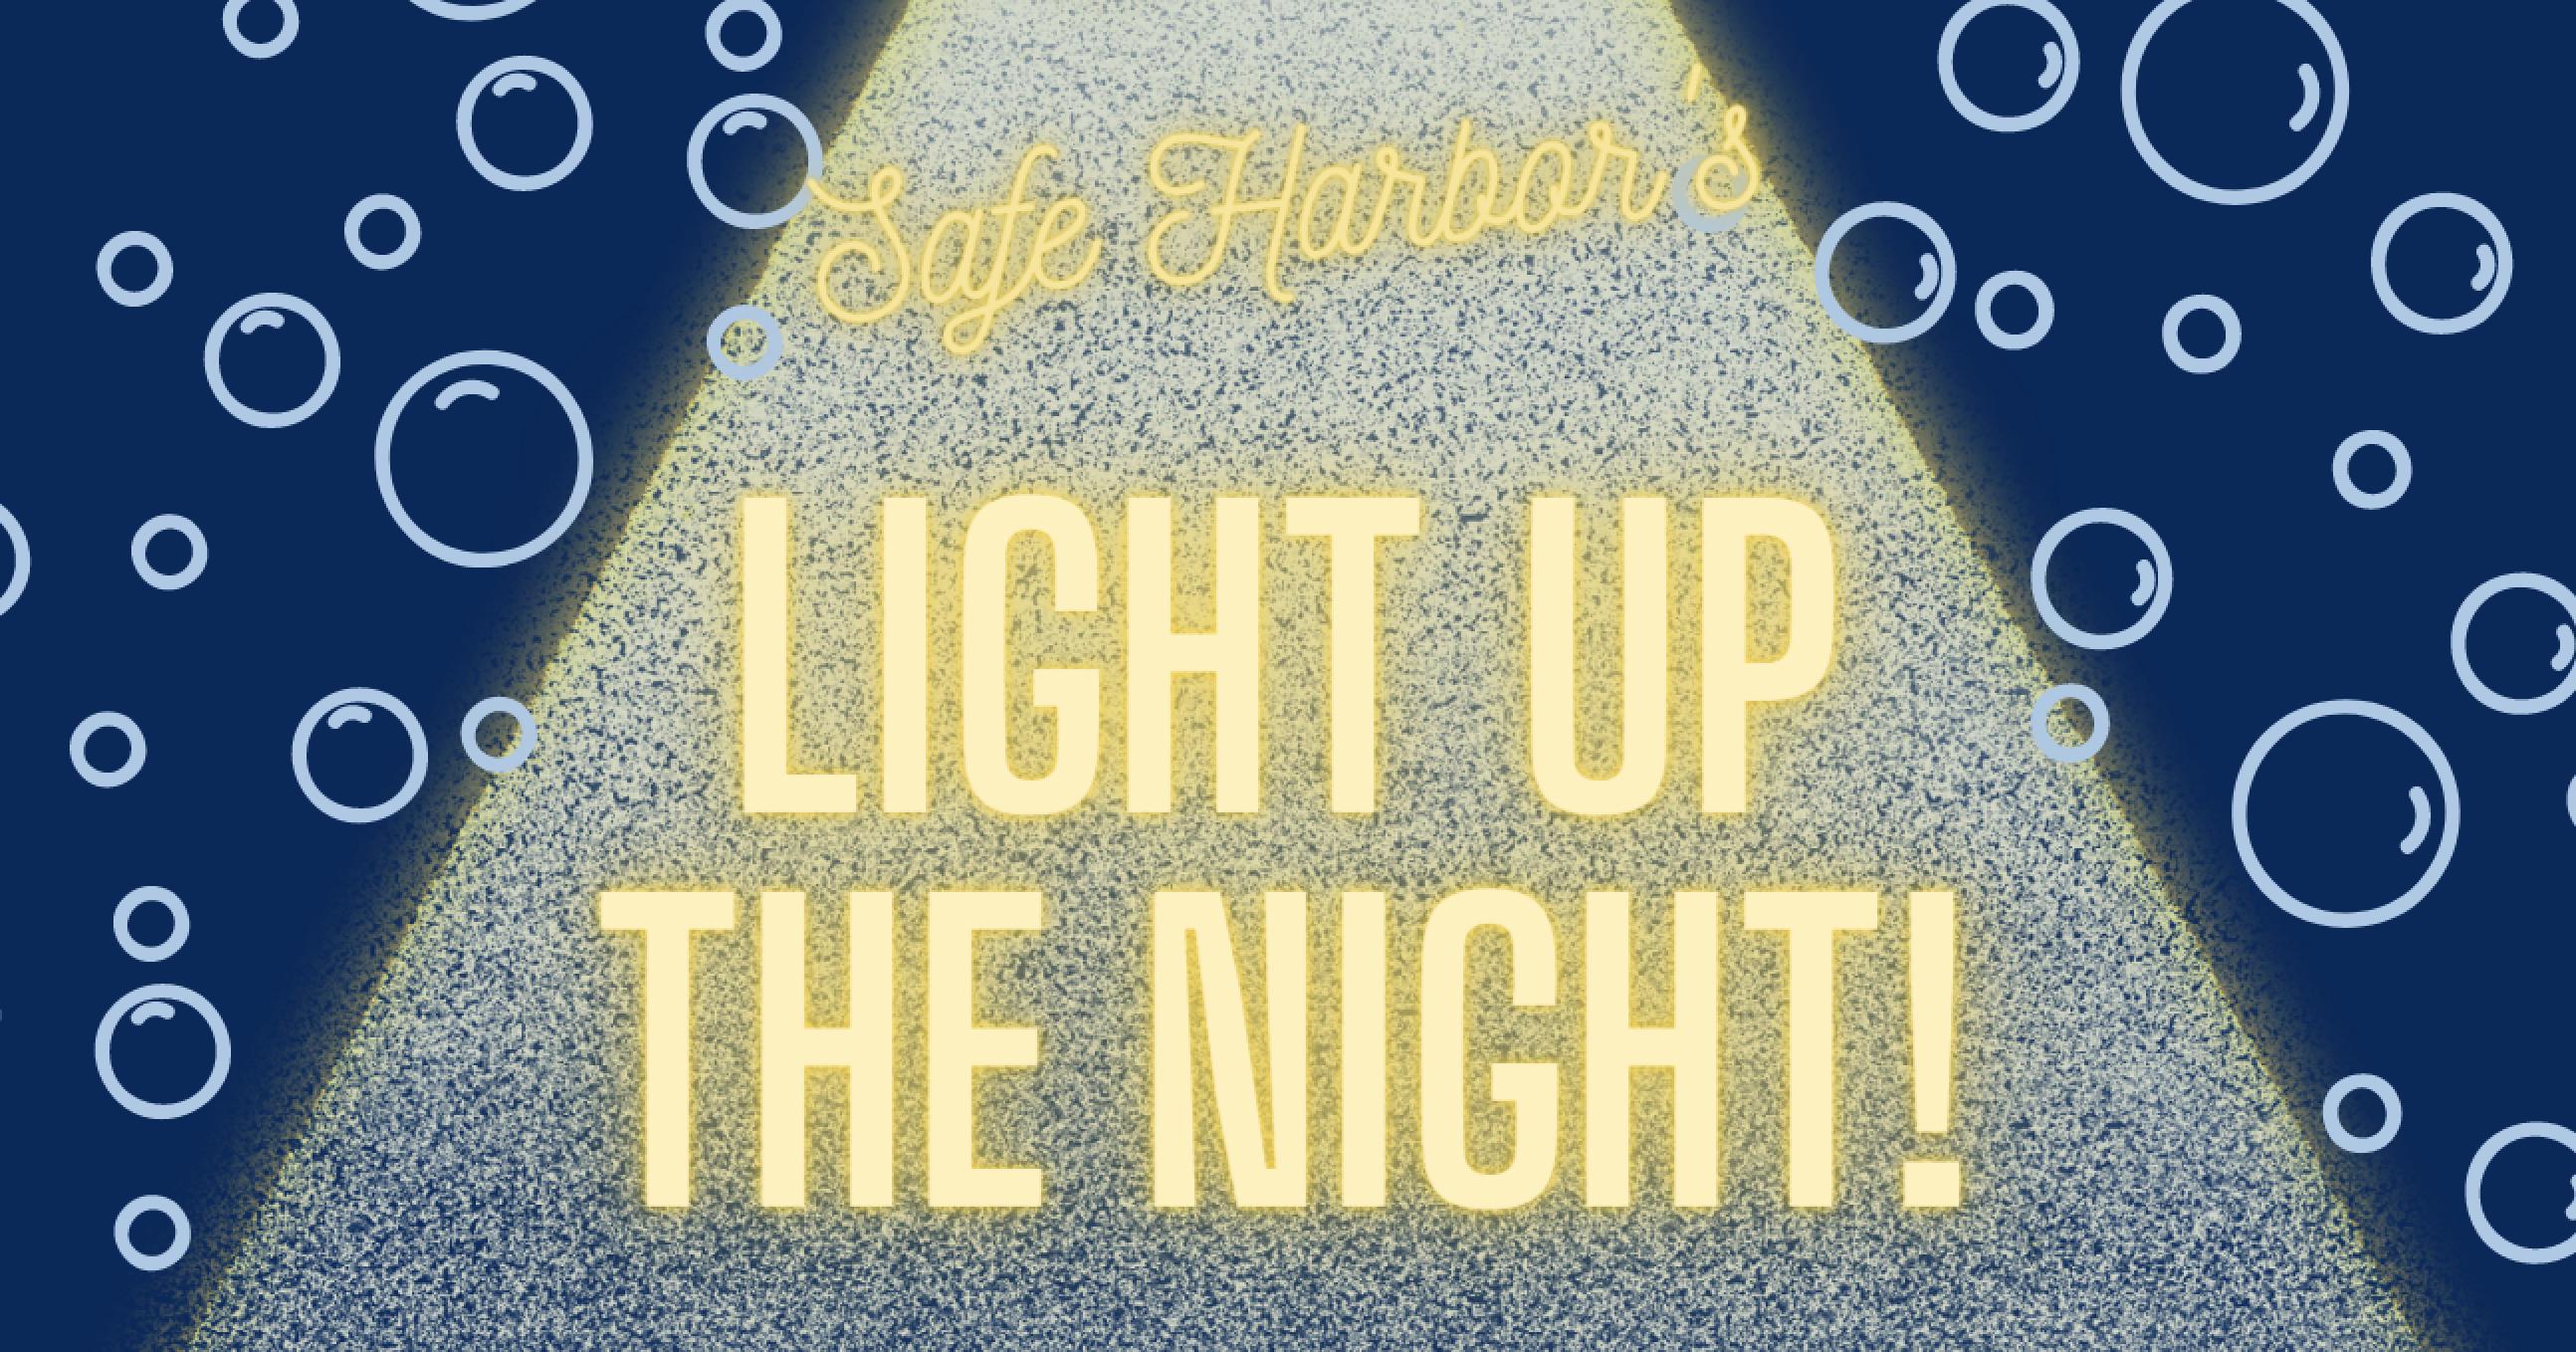 Safe Harbor's Light Up The Night banner